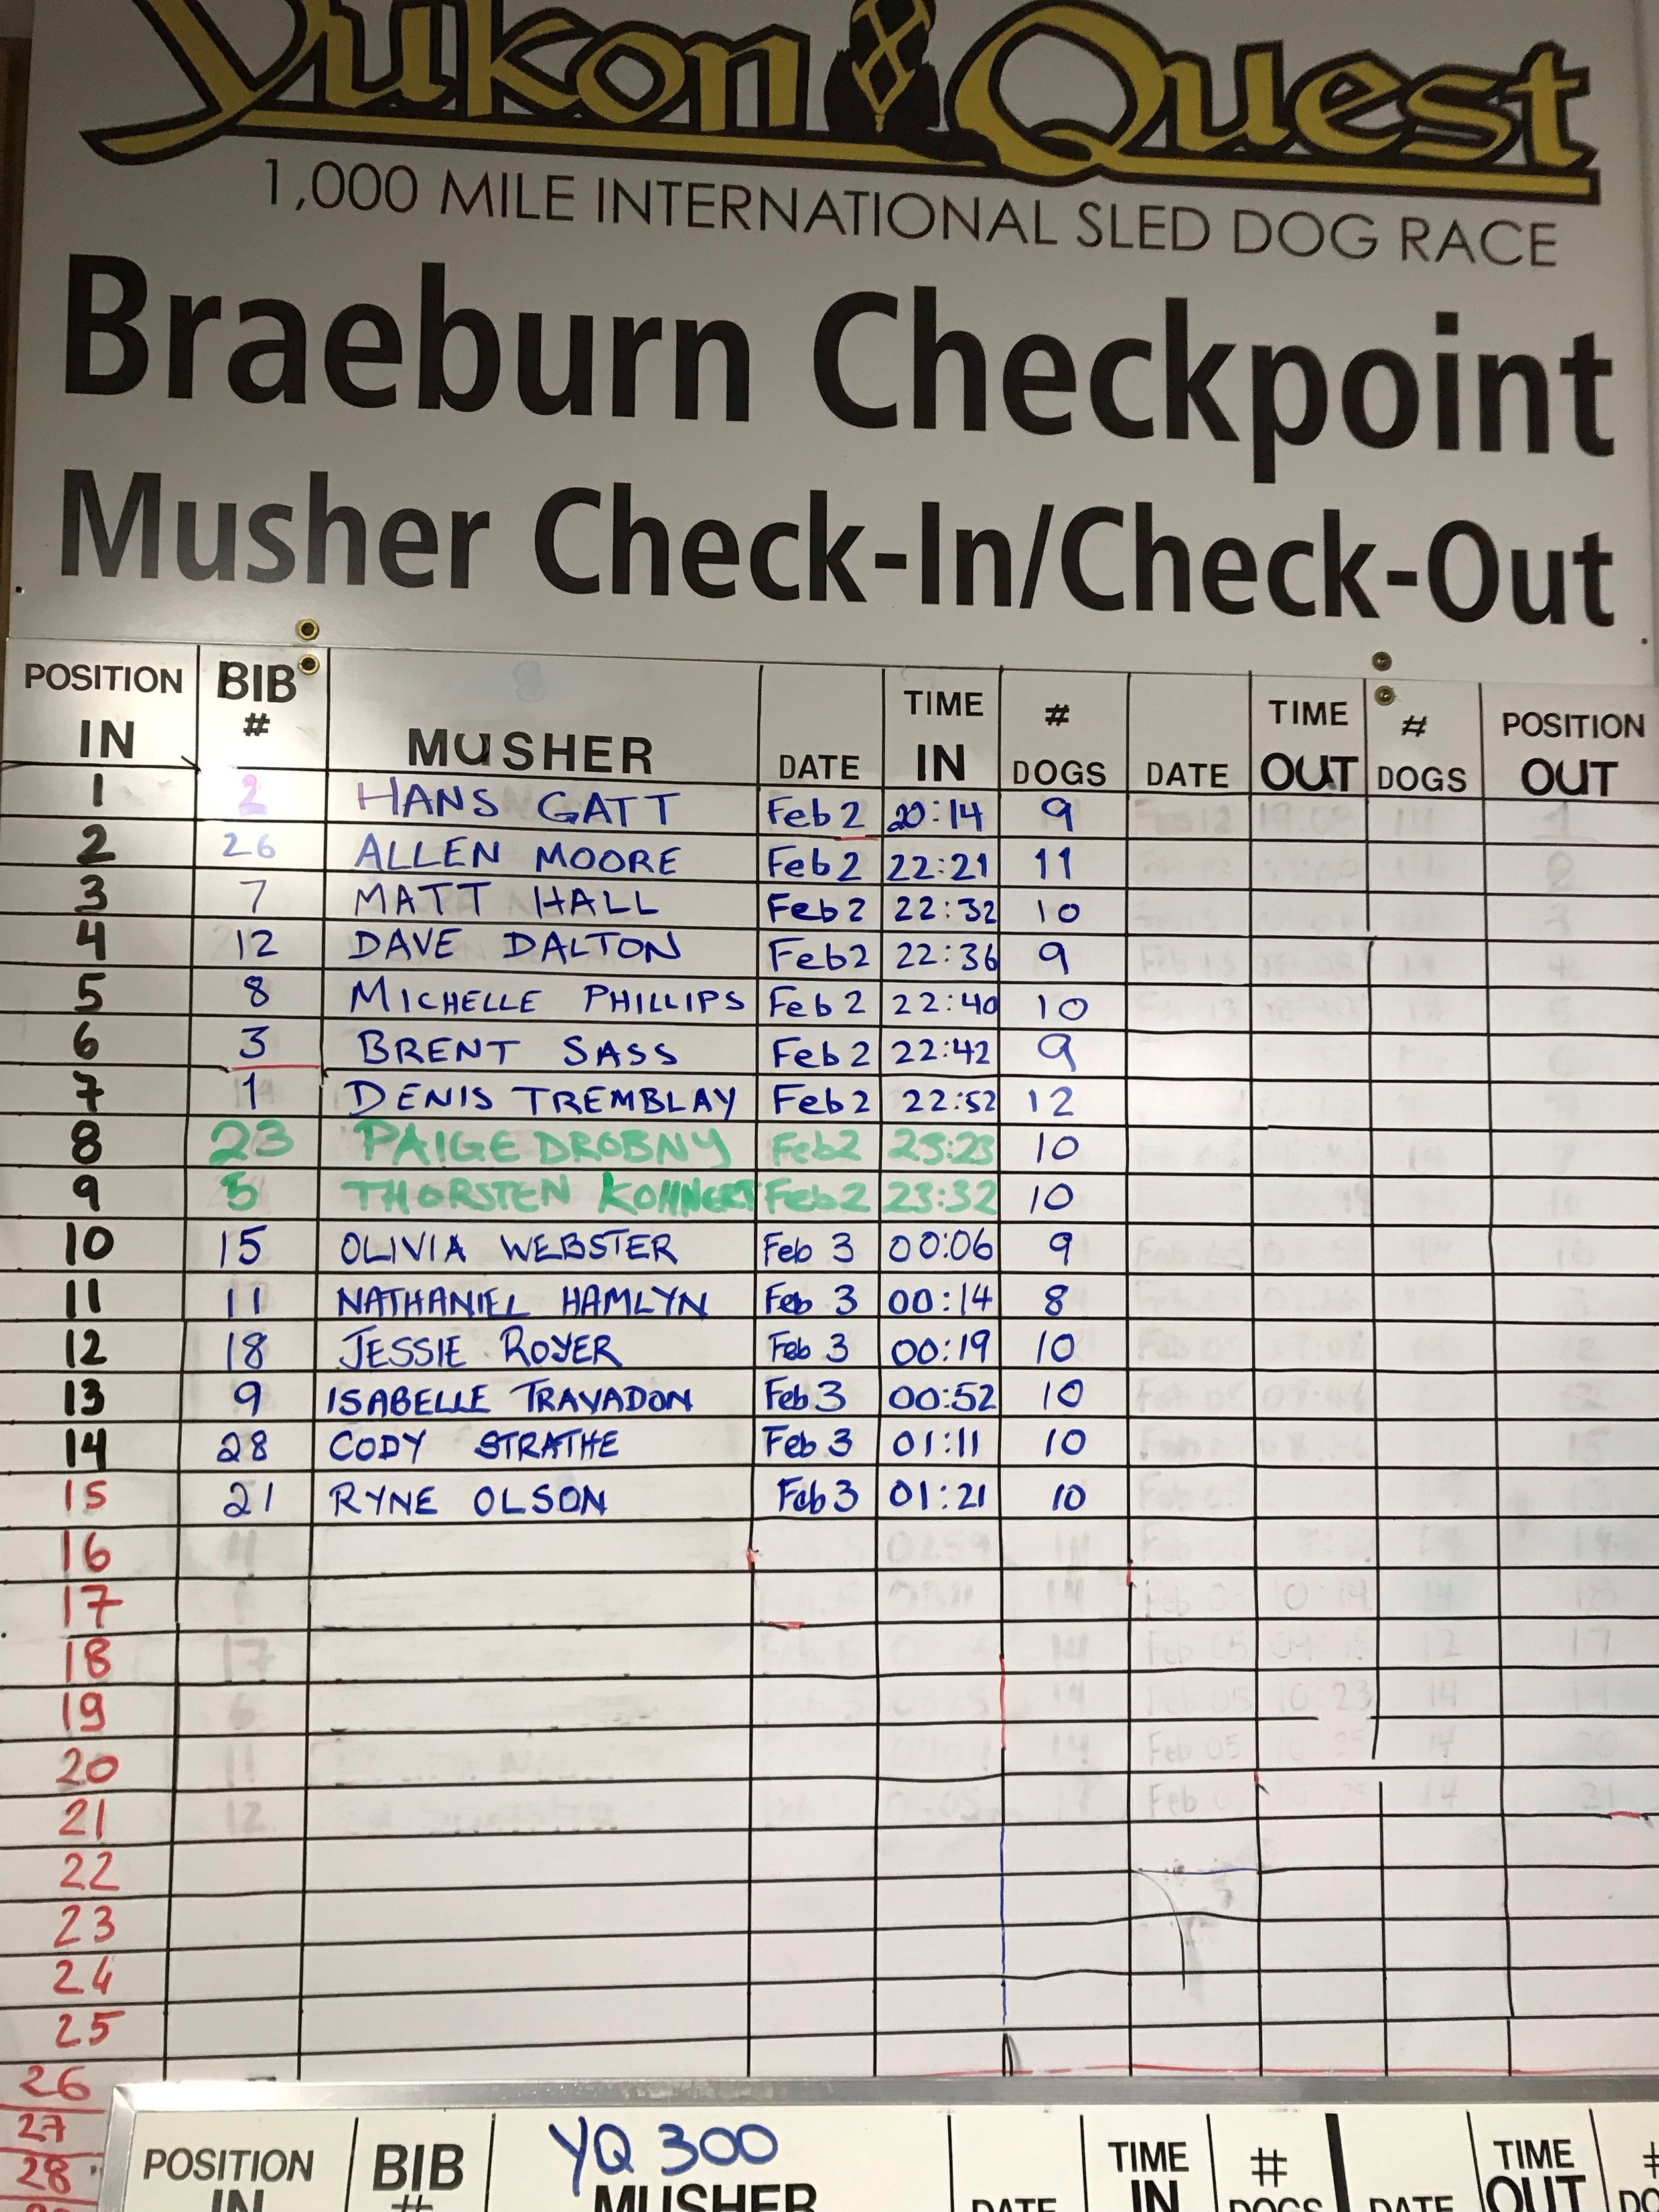 22 Braeburn board.jpg